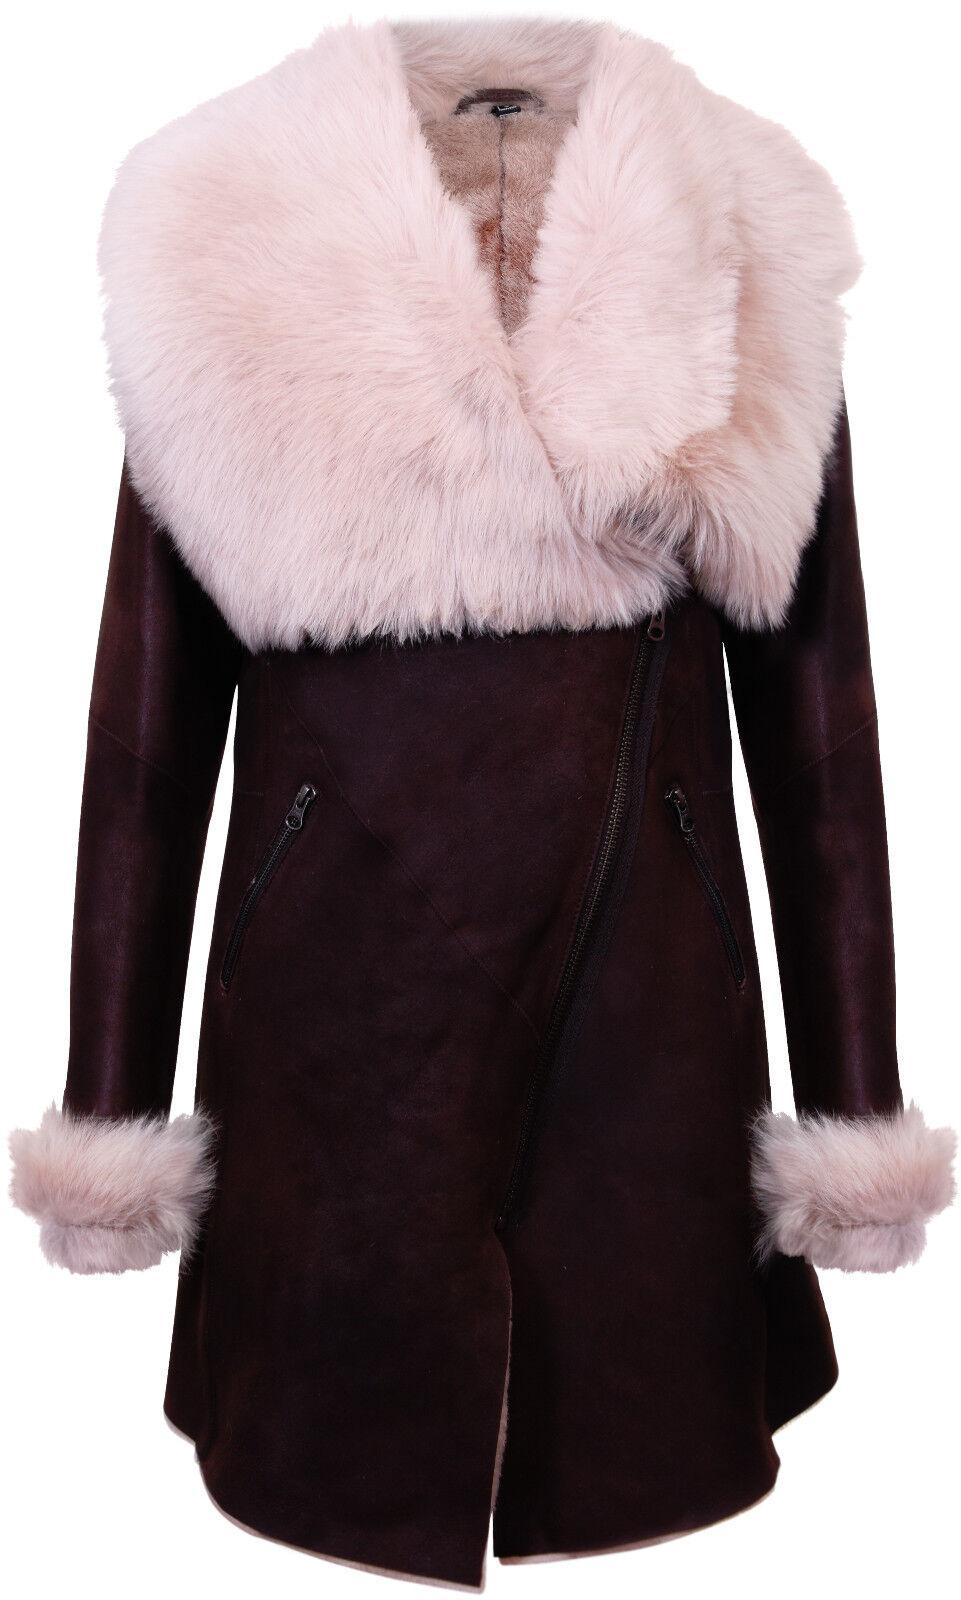 Women's Brown Cream Suede Merino Shearling Sheepskin Coat With Toscana Collar